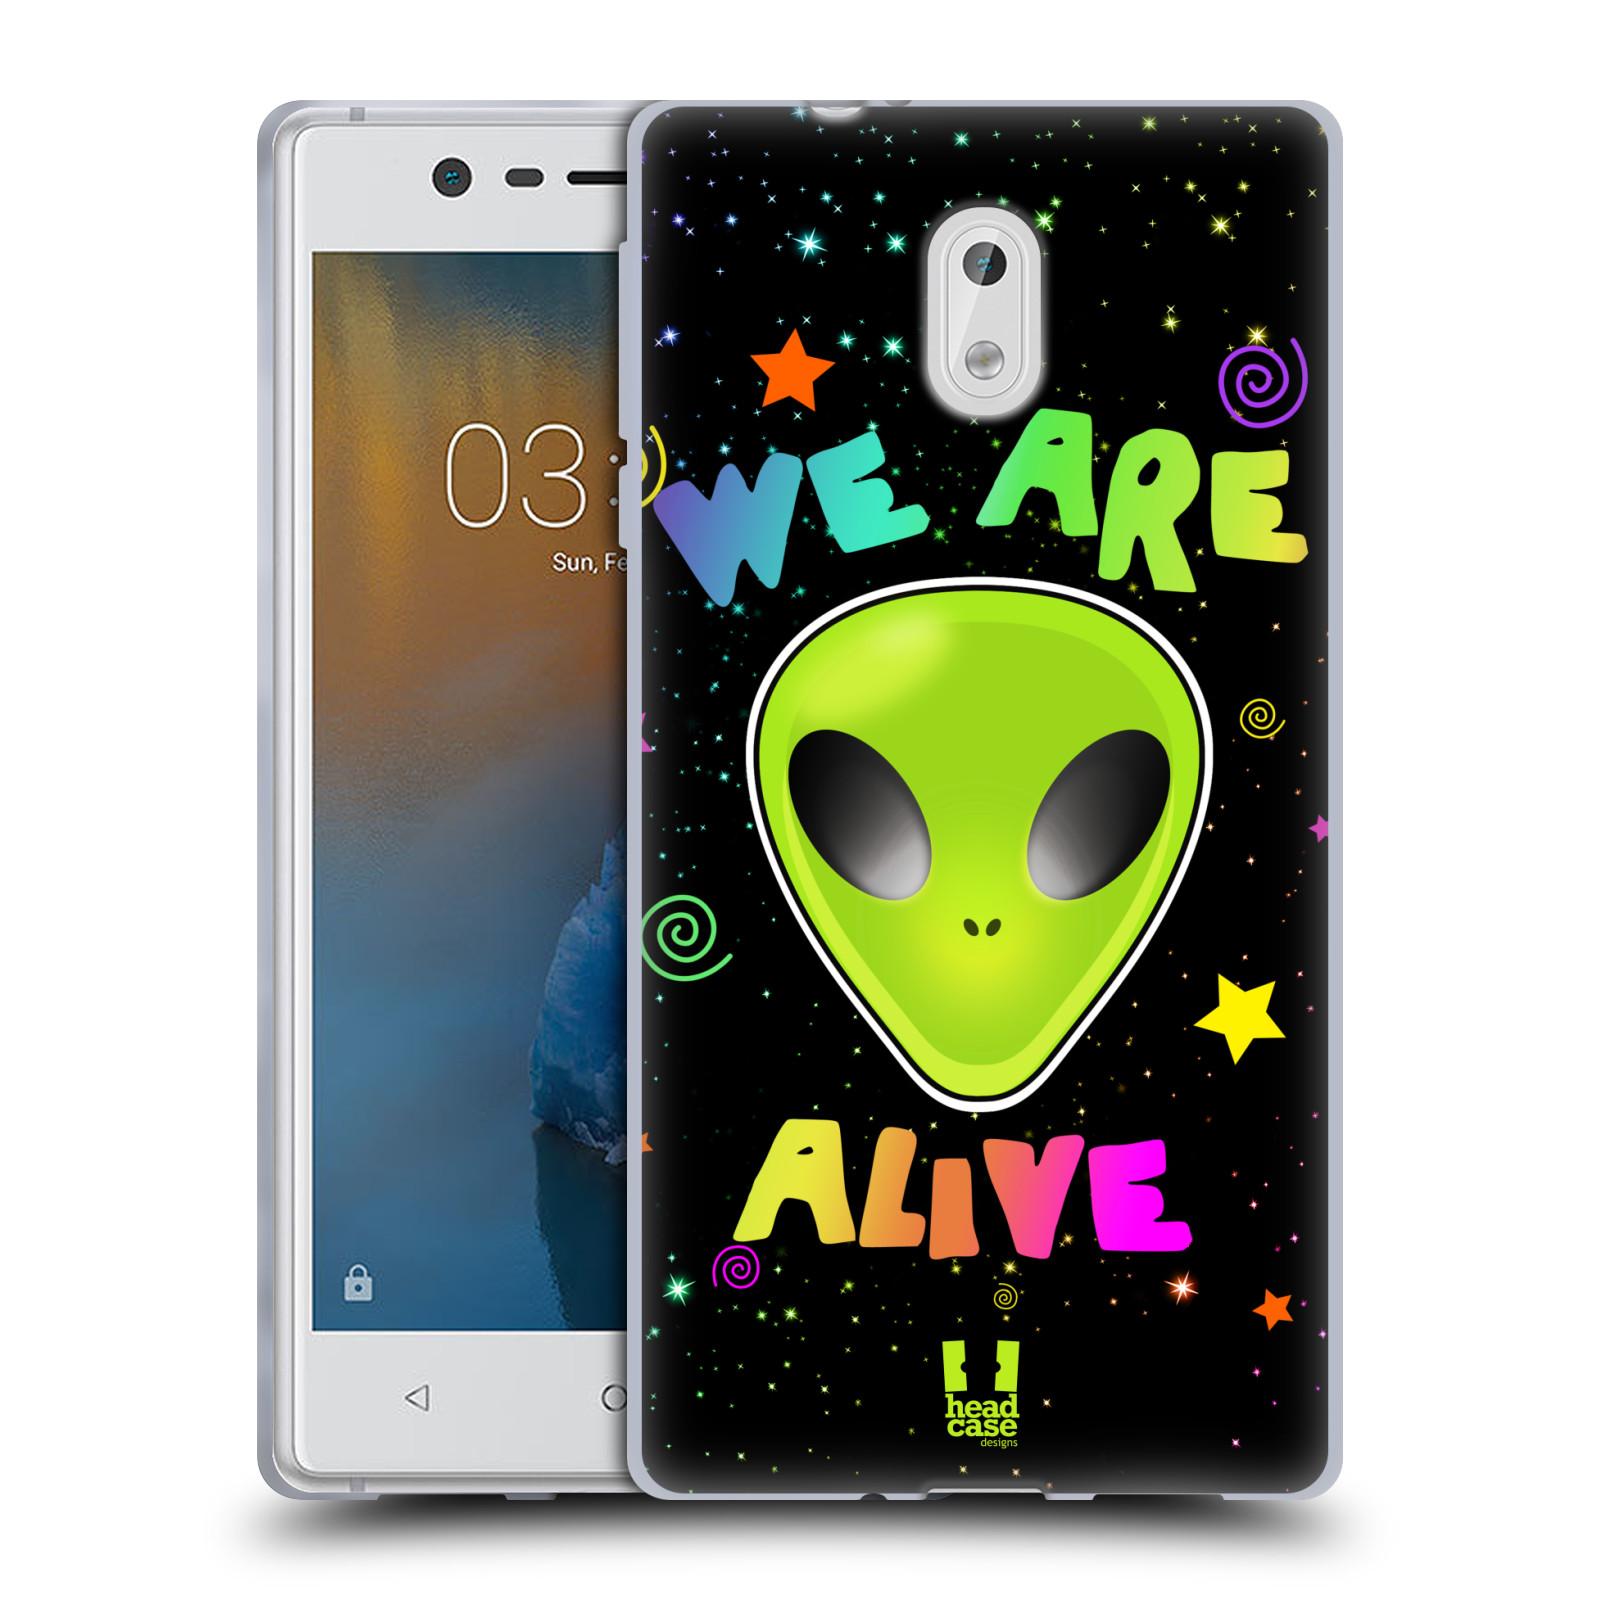 Silikonové pouzdro na mobil Nokia 3 Head Case - ALIENS ALIVE